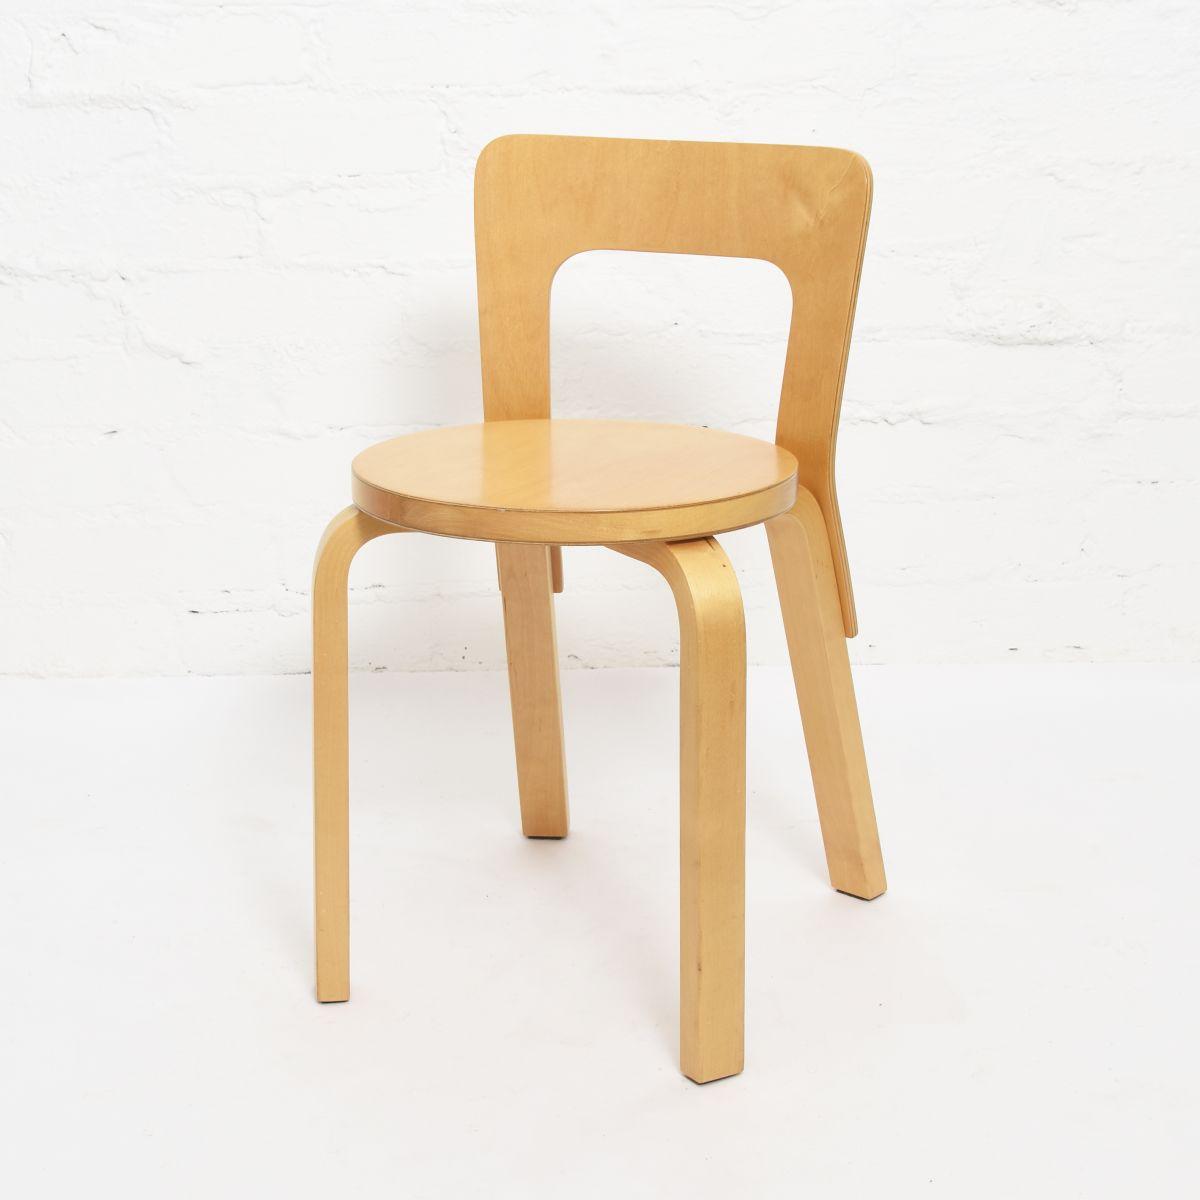 Aalto-Alvar-Chair65-Birch-Finger-Joint